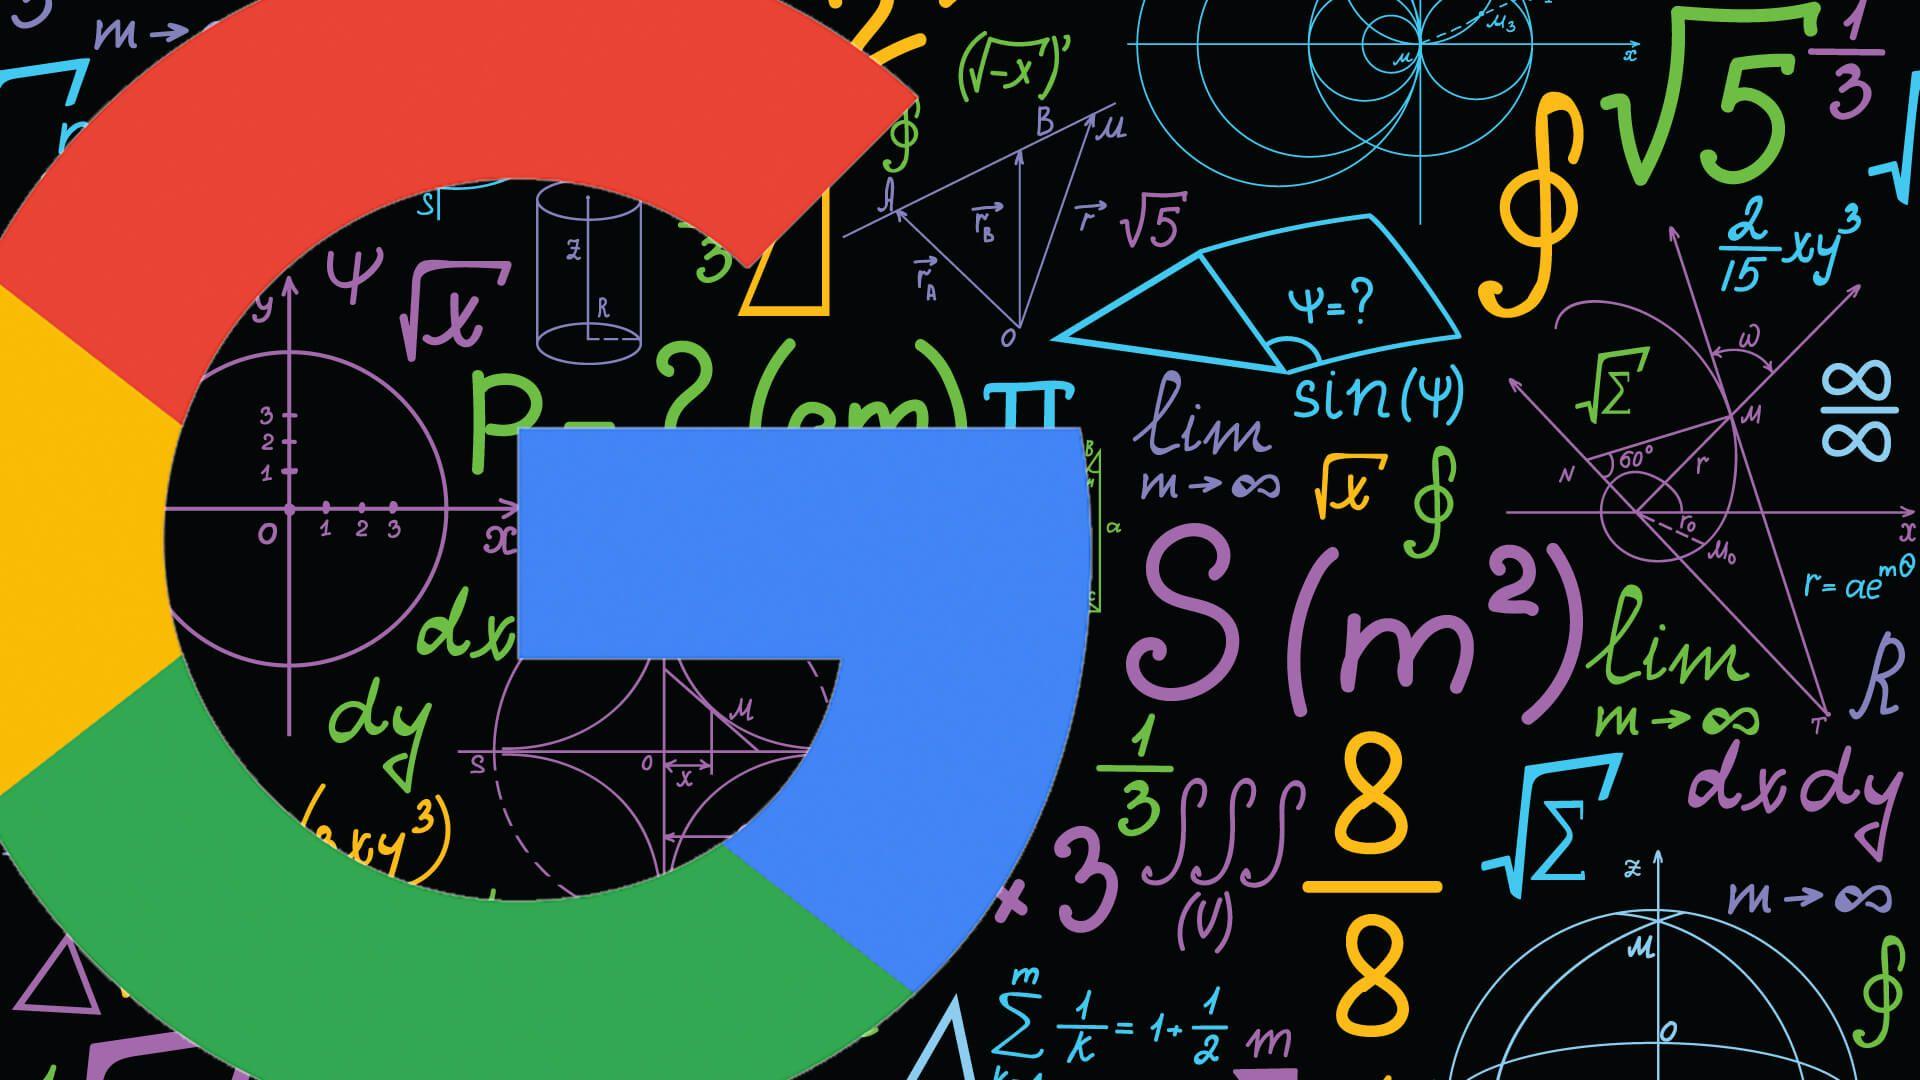 Sejarah Berdirinya Google - Mesin Pencari Paling Terkenal Di Dunia